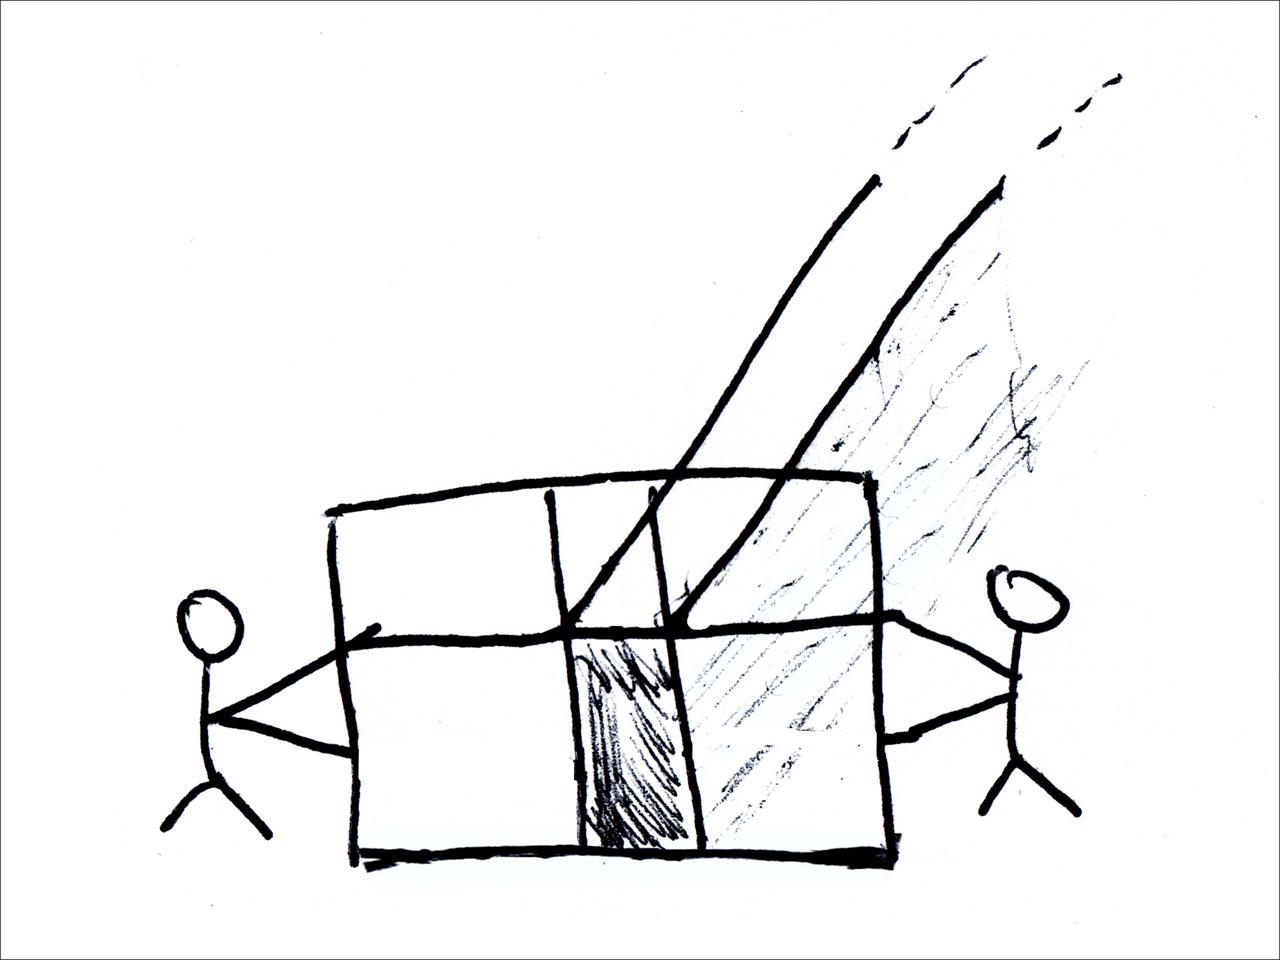 performance 2 (passage), floating